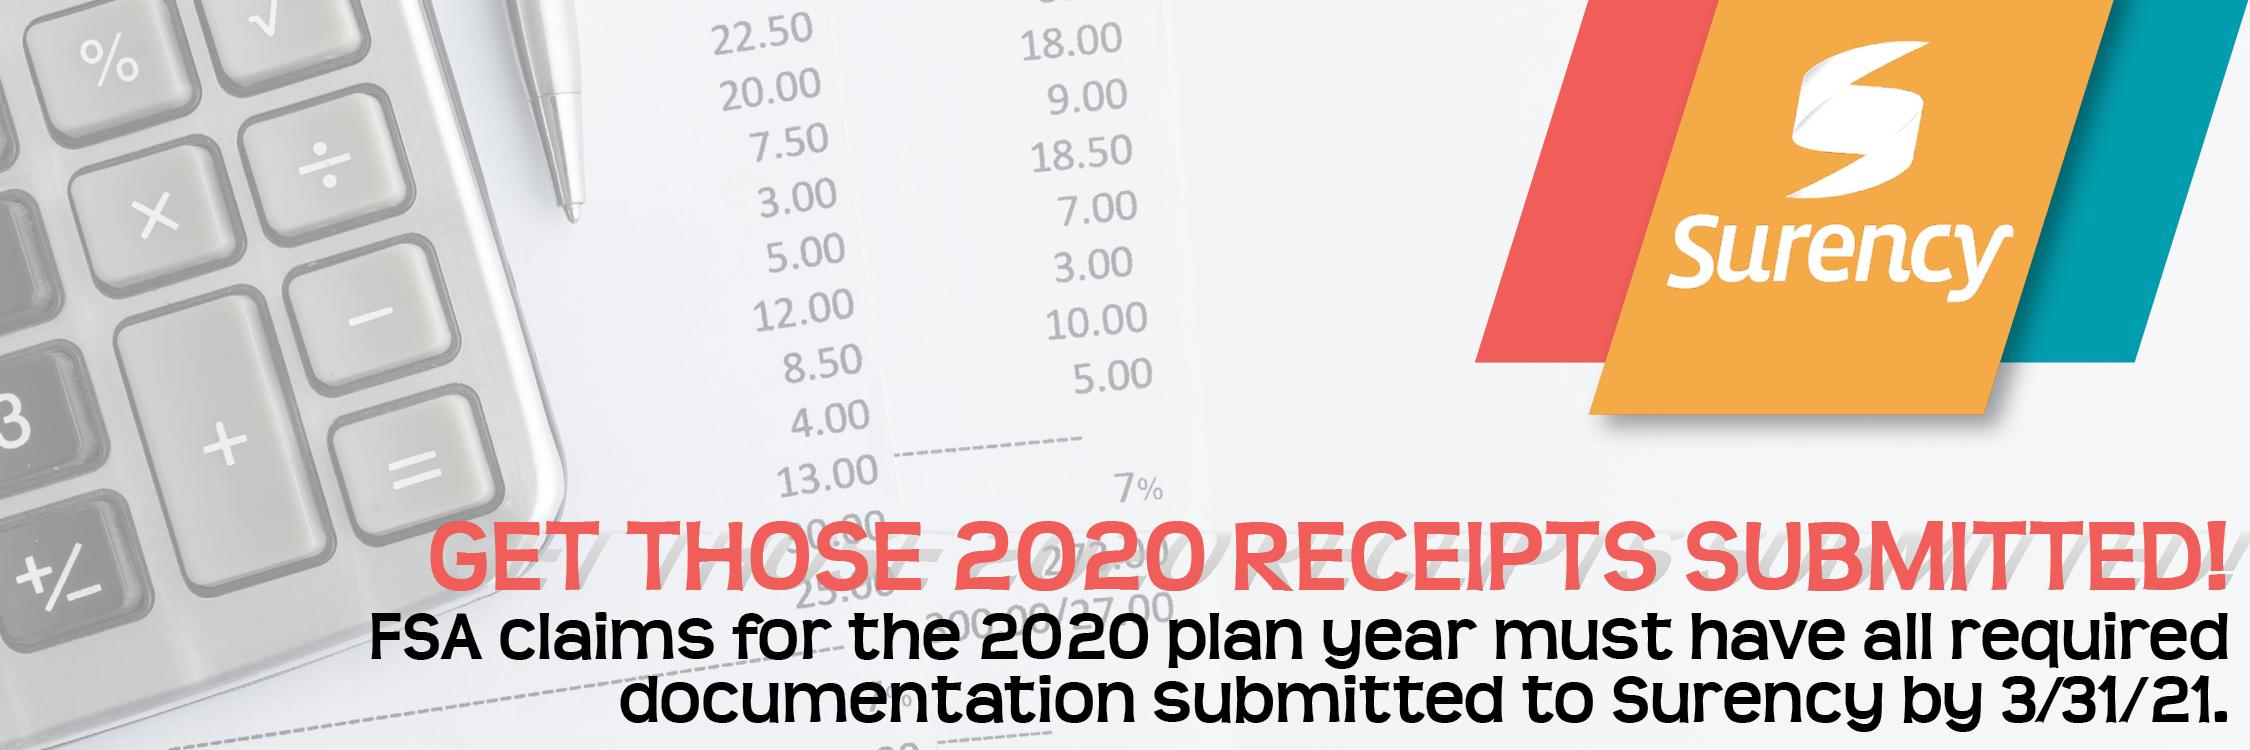 Image 1: 2020 FSA Receipts